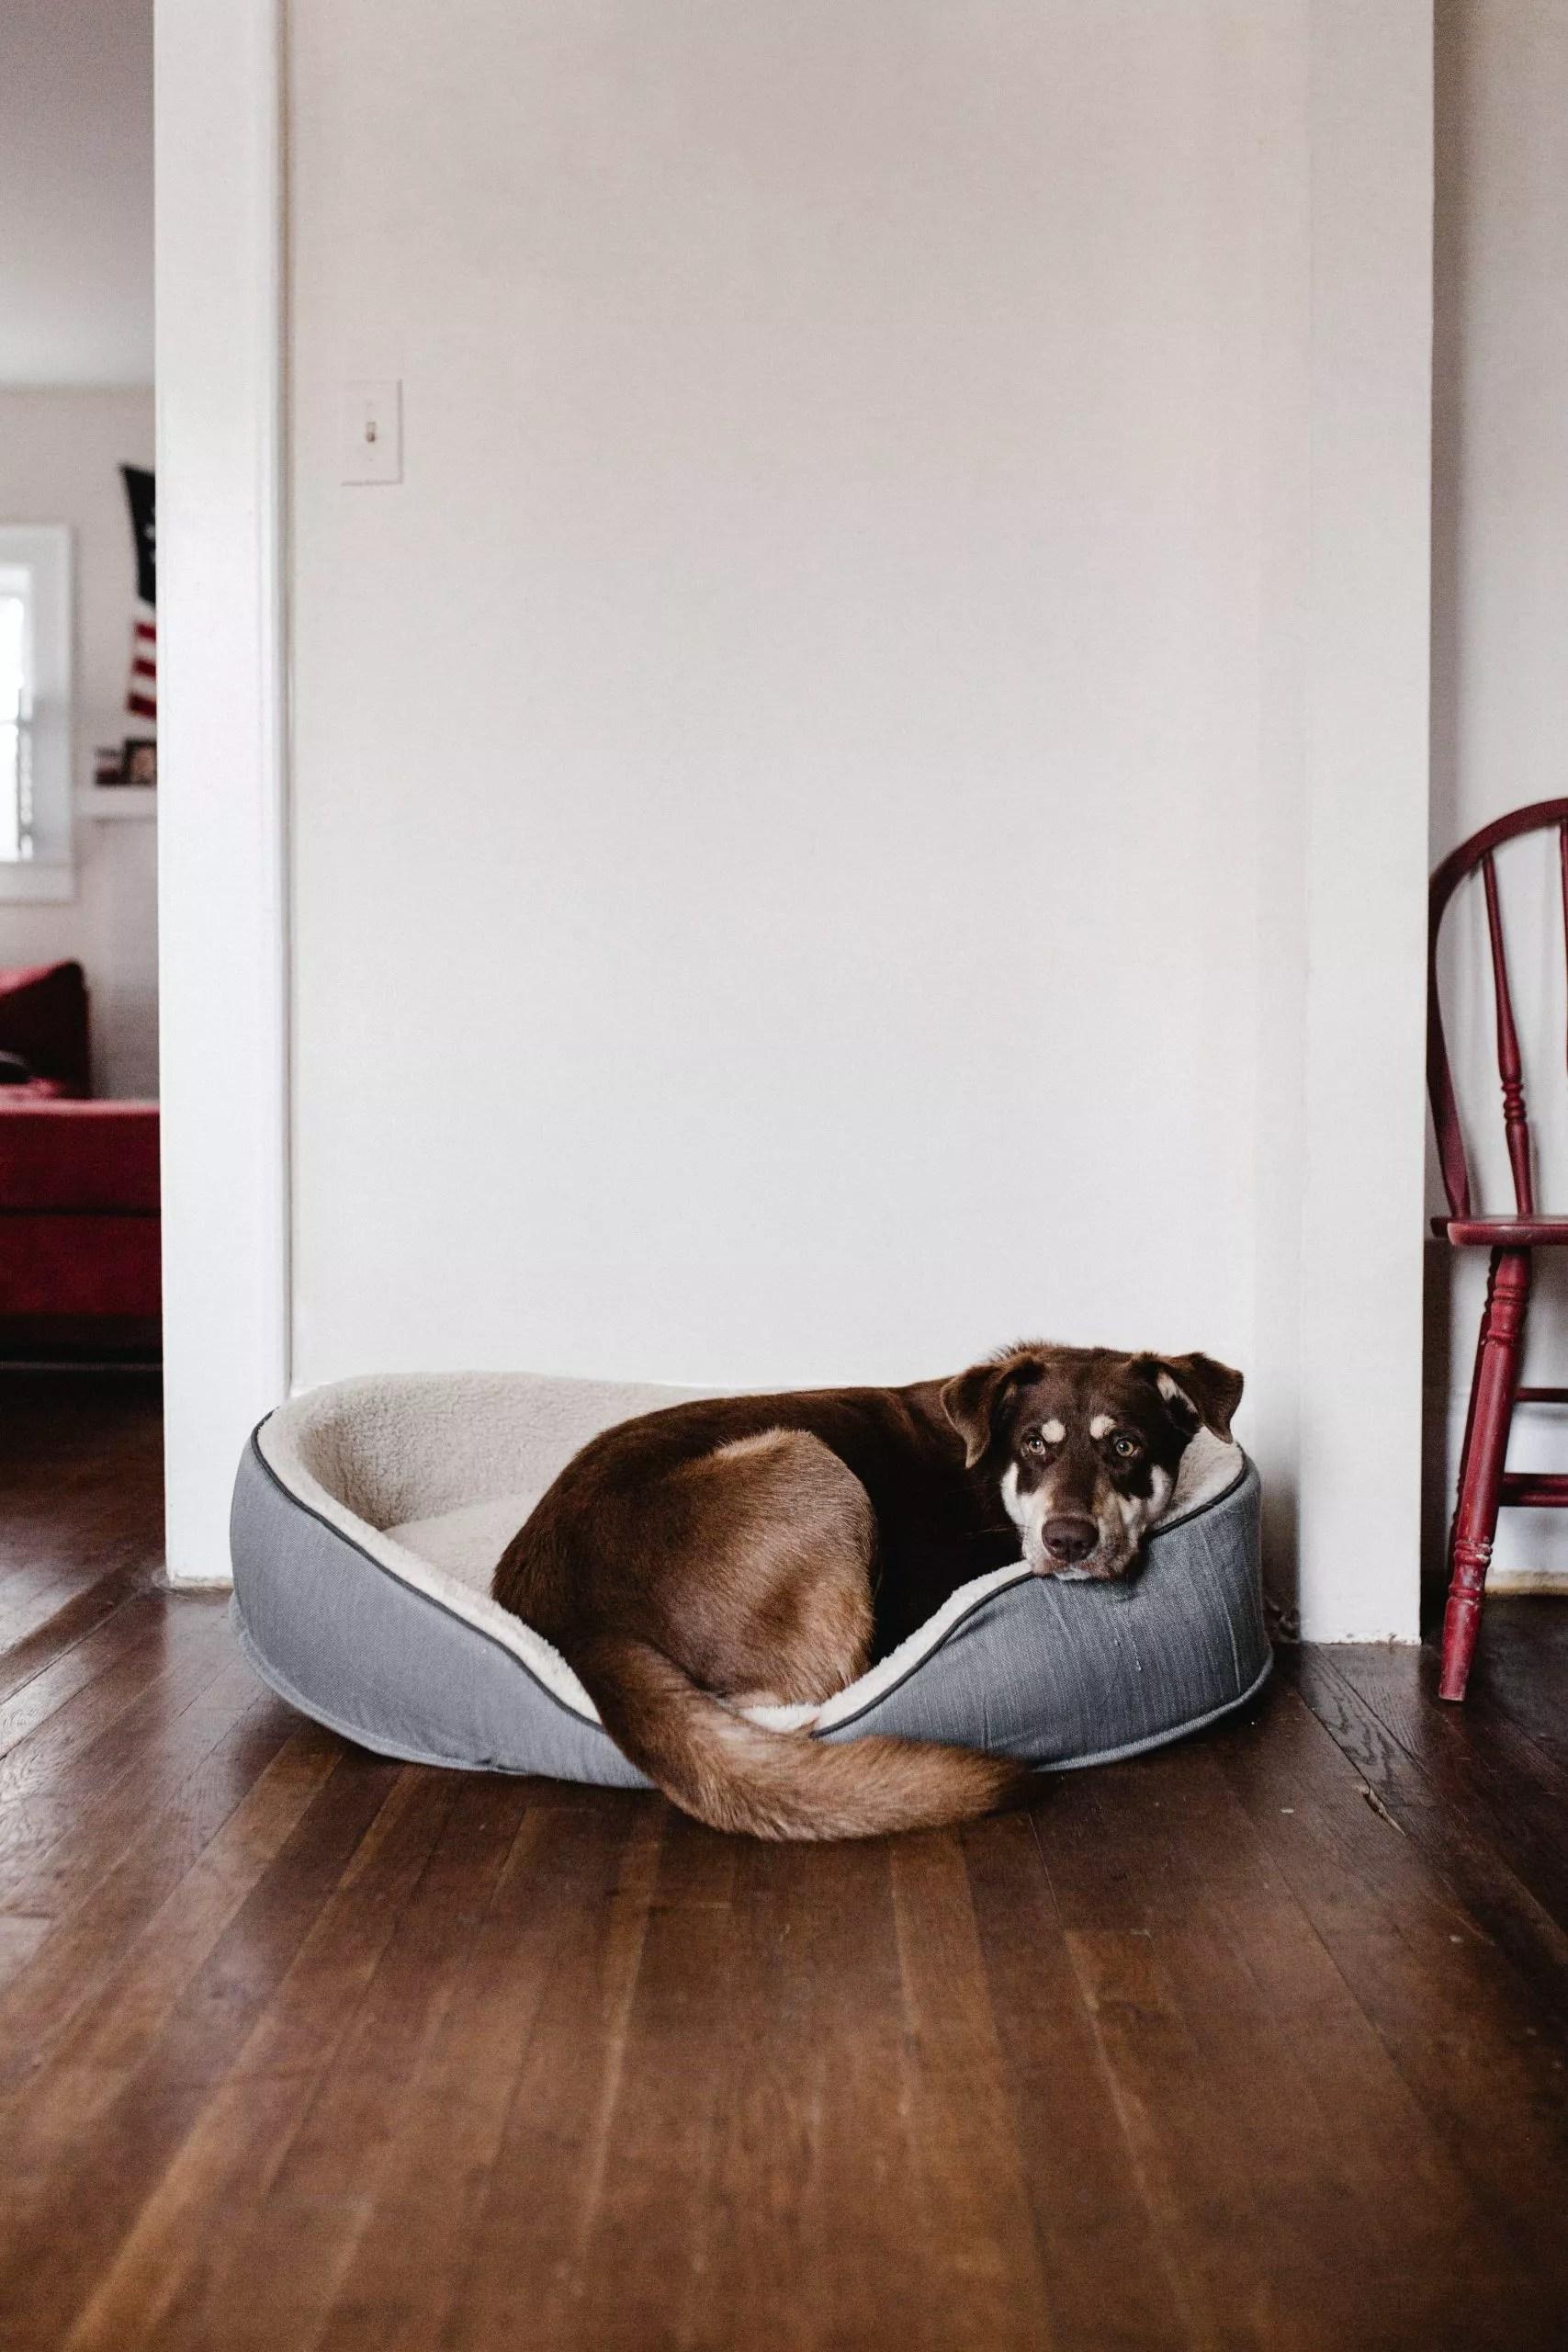 Weimaraner Training-5 Rules For Successful Dog Training